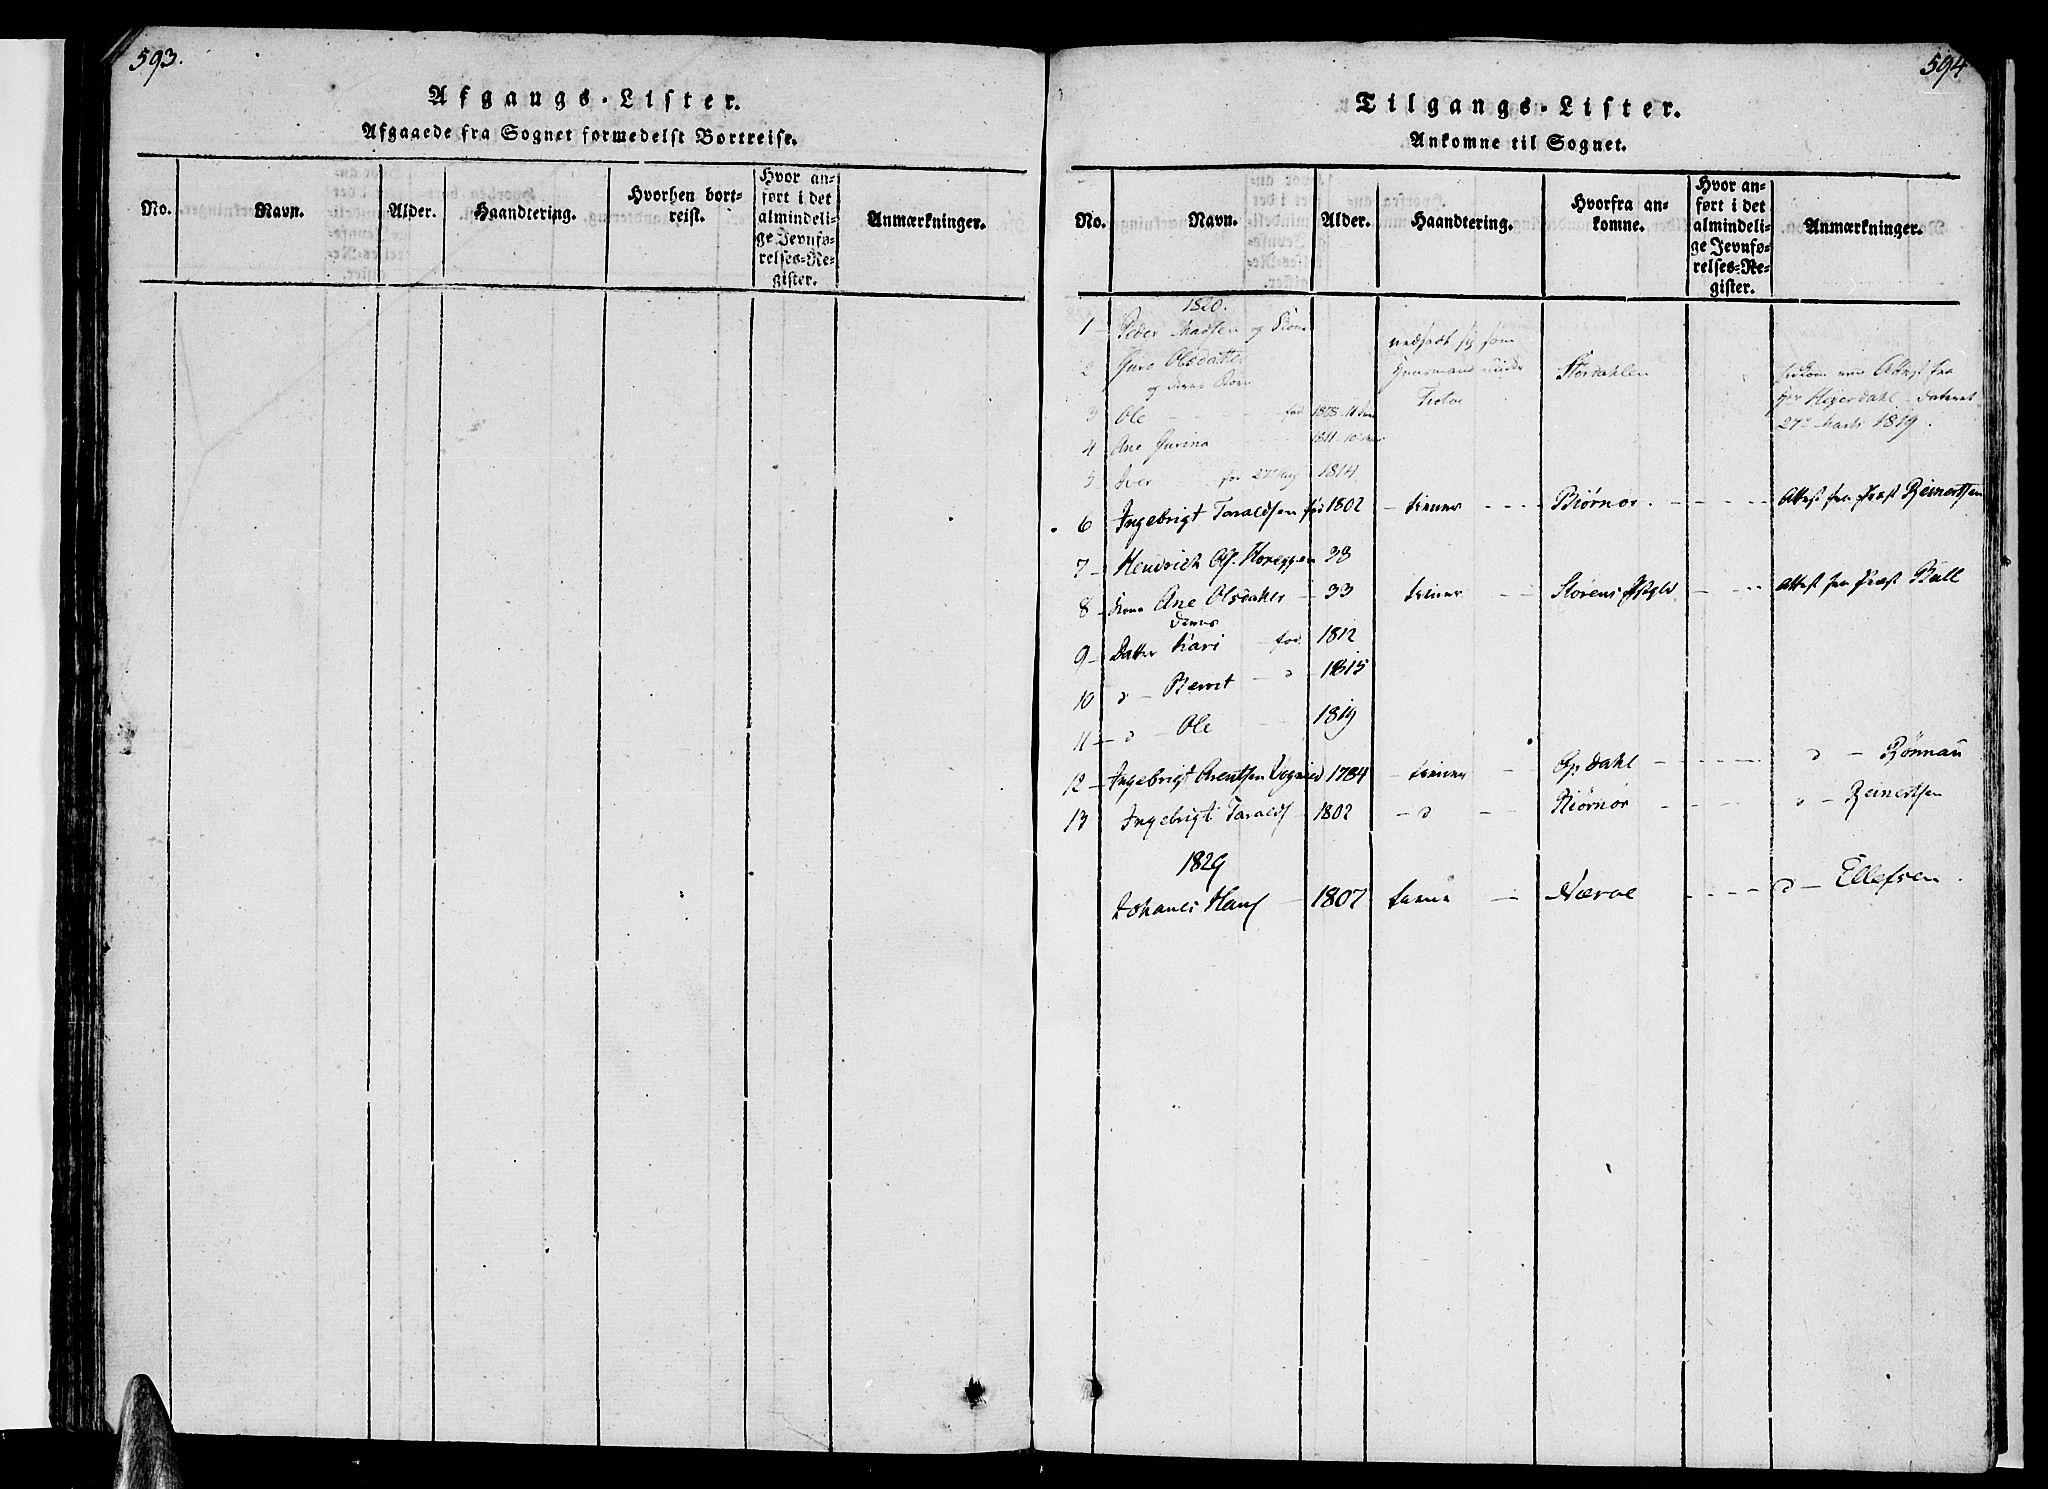 SAT, Ministerialprotokoller, klokkerbøker og fødselsregistre - Nordland, 830/L0445: Ministerialbok nr. 830A09, 1820-1830, s. 593-594